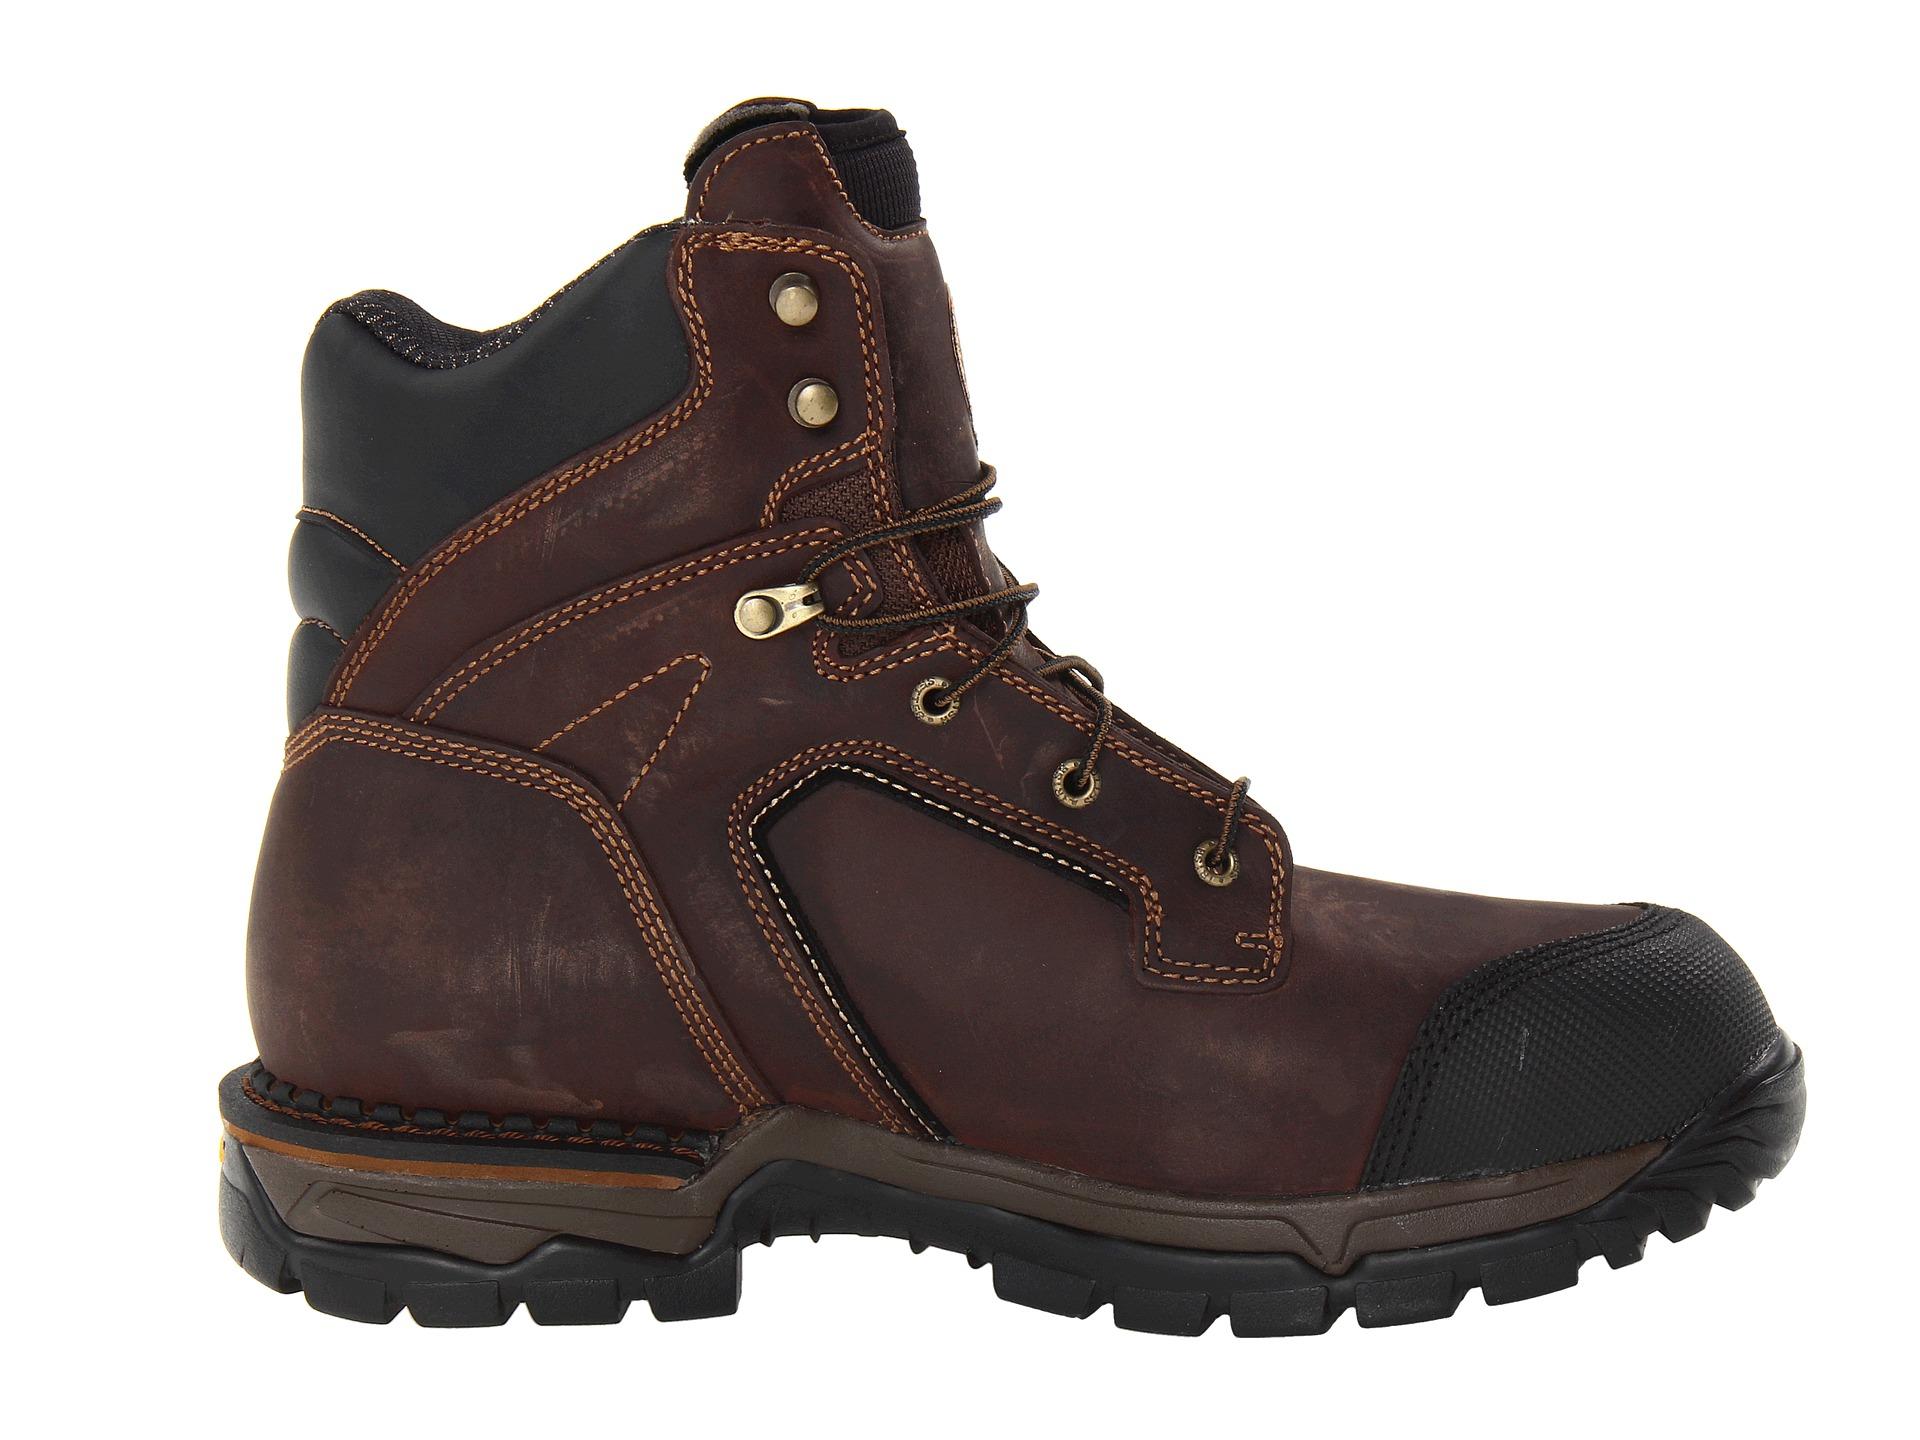 Irish Setter 6 Steel Toe Boots Video